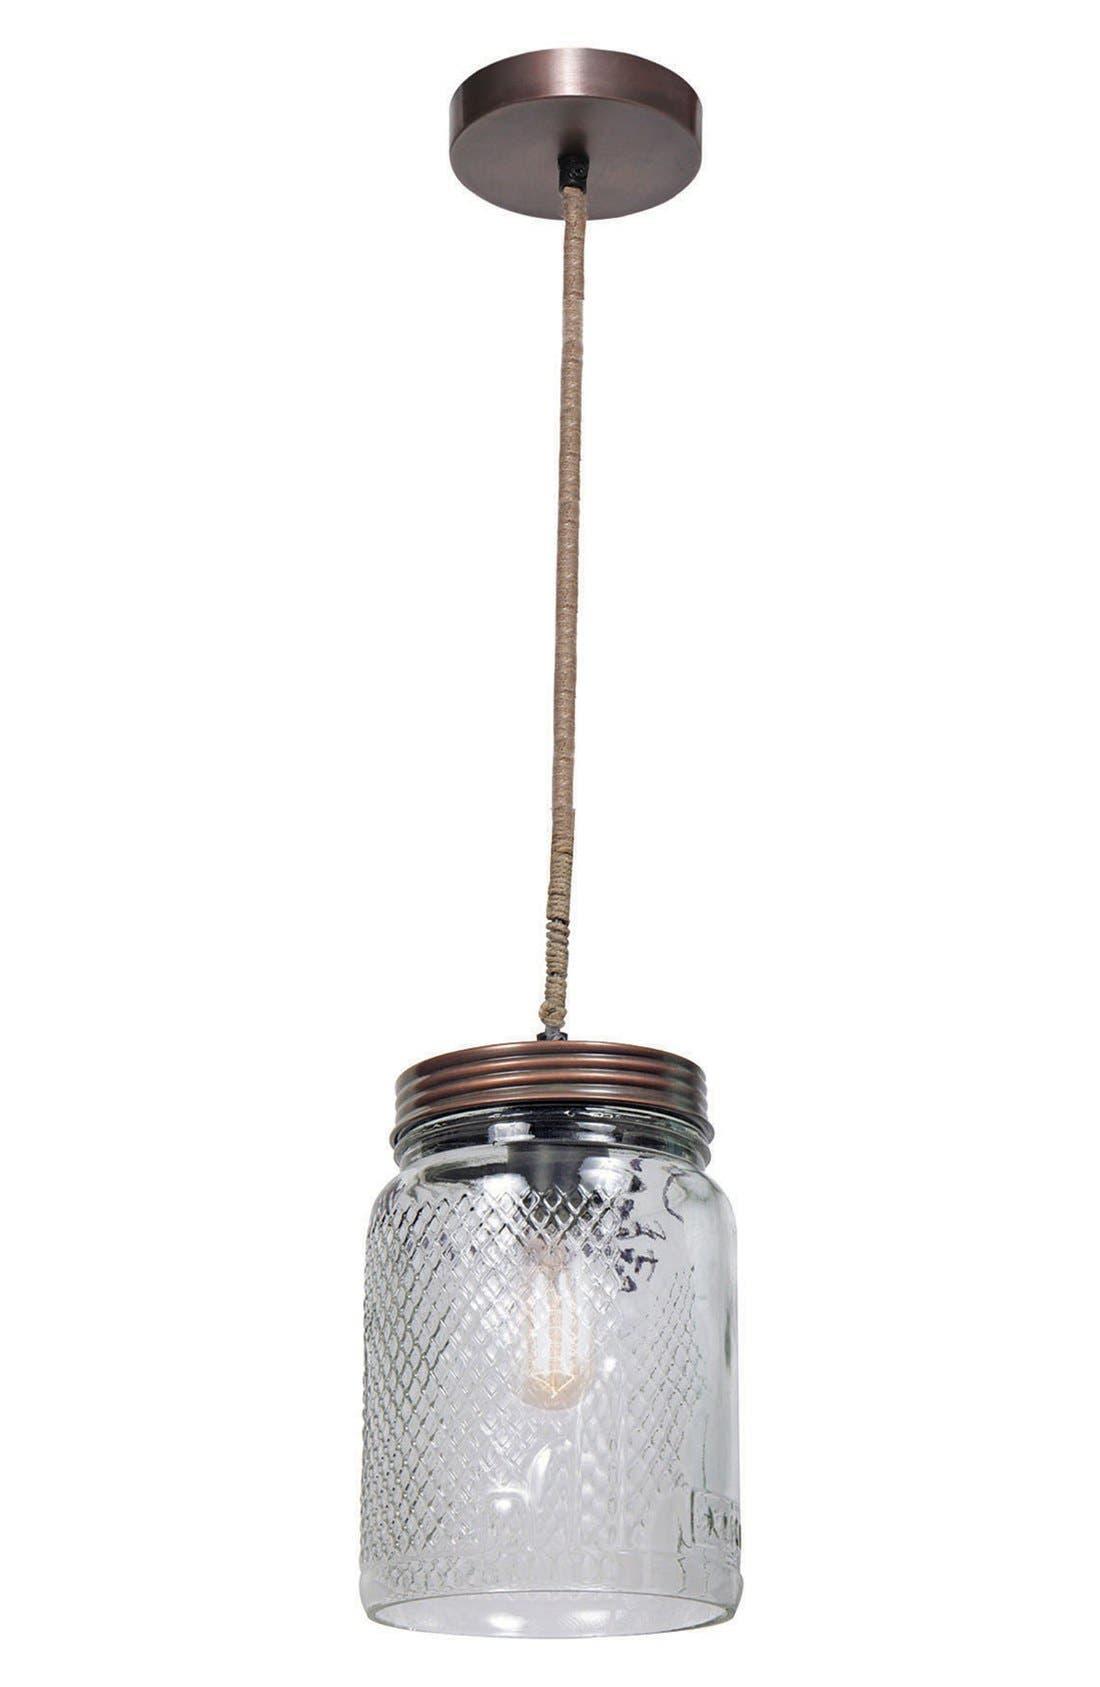 'Mason Jar' Ceiling Light Fixture,                             Main thumbnail 1, color,